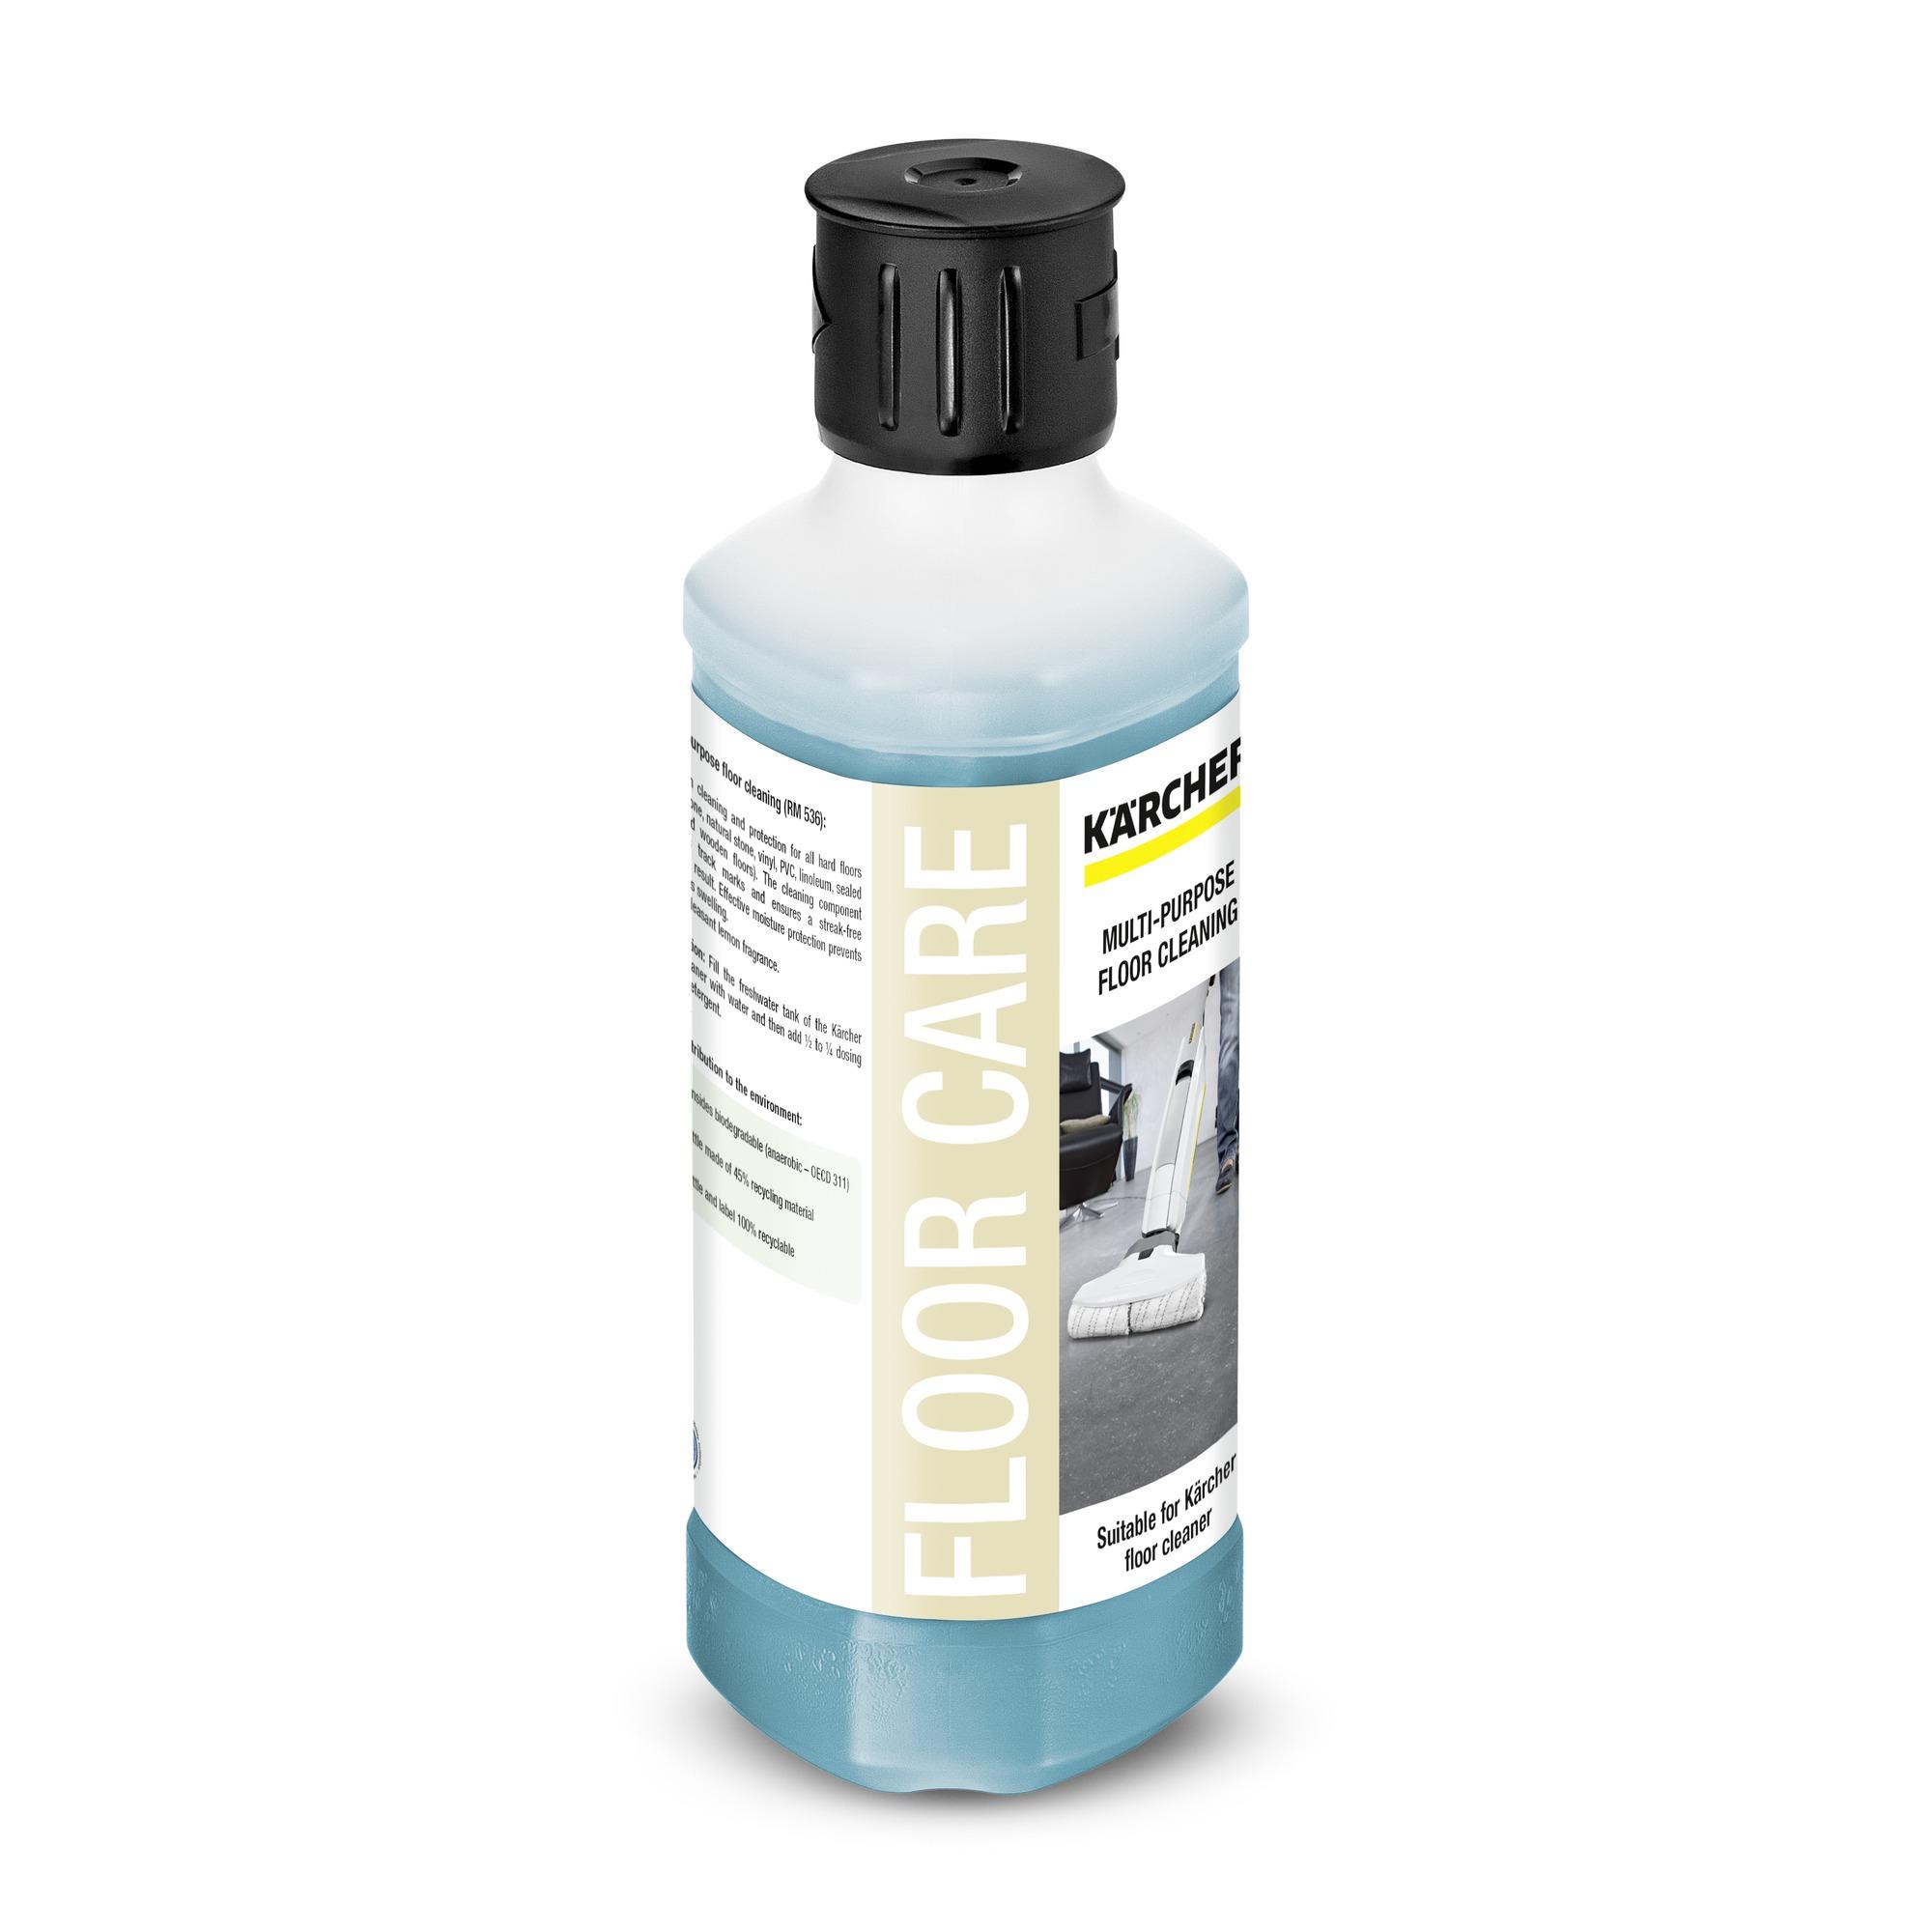 FC detergent 536, 500 ml Universeel